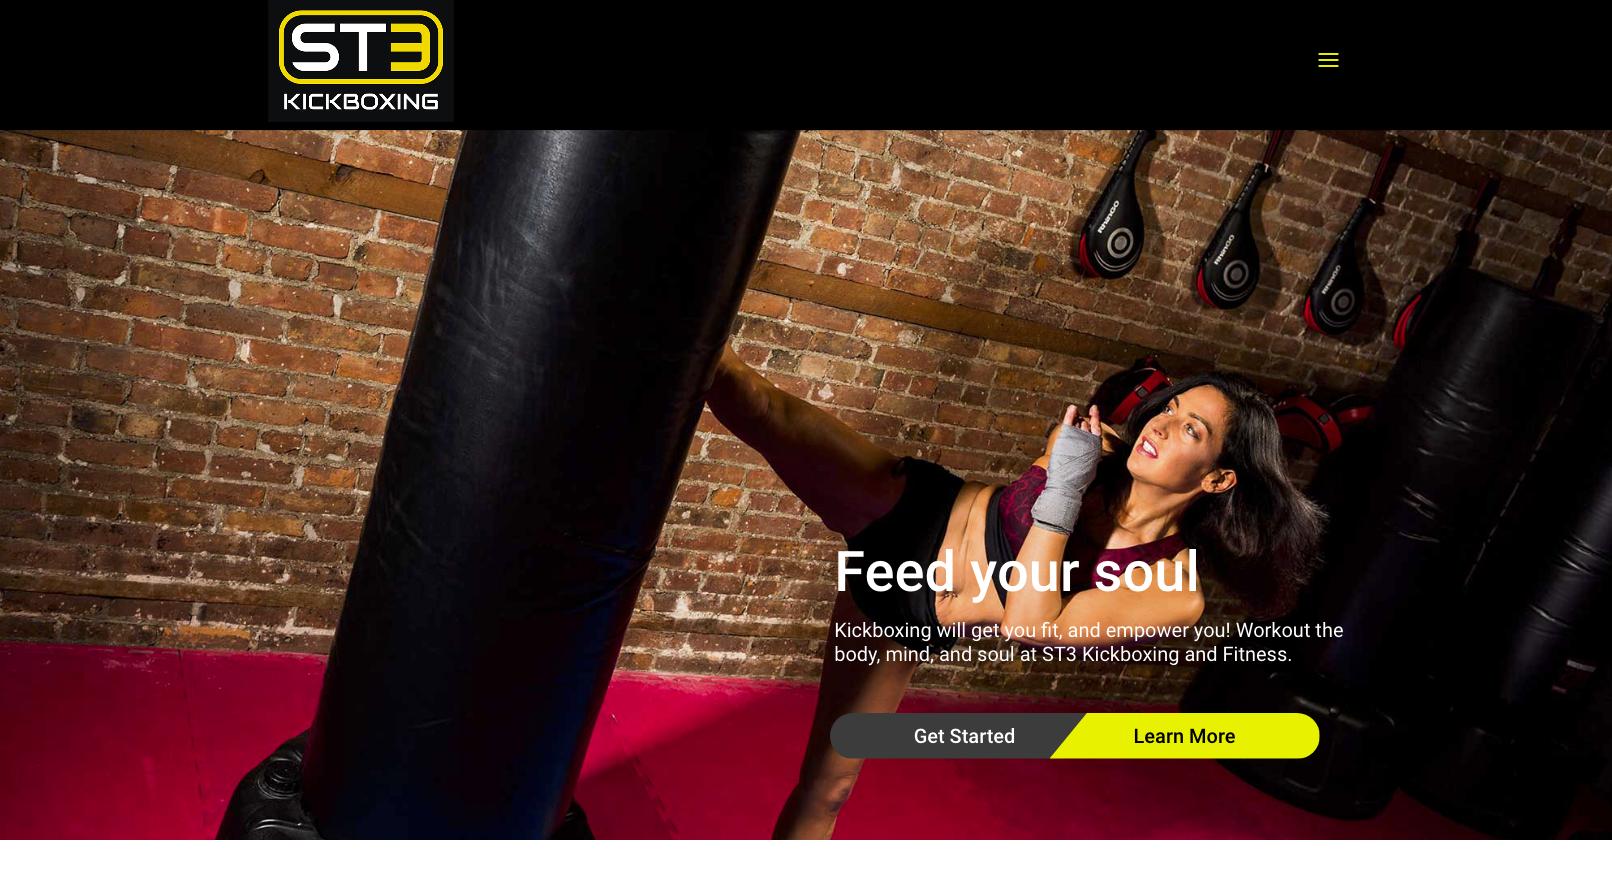 ST3 Kickboxing Branding Photos